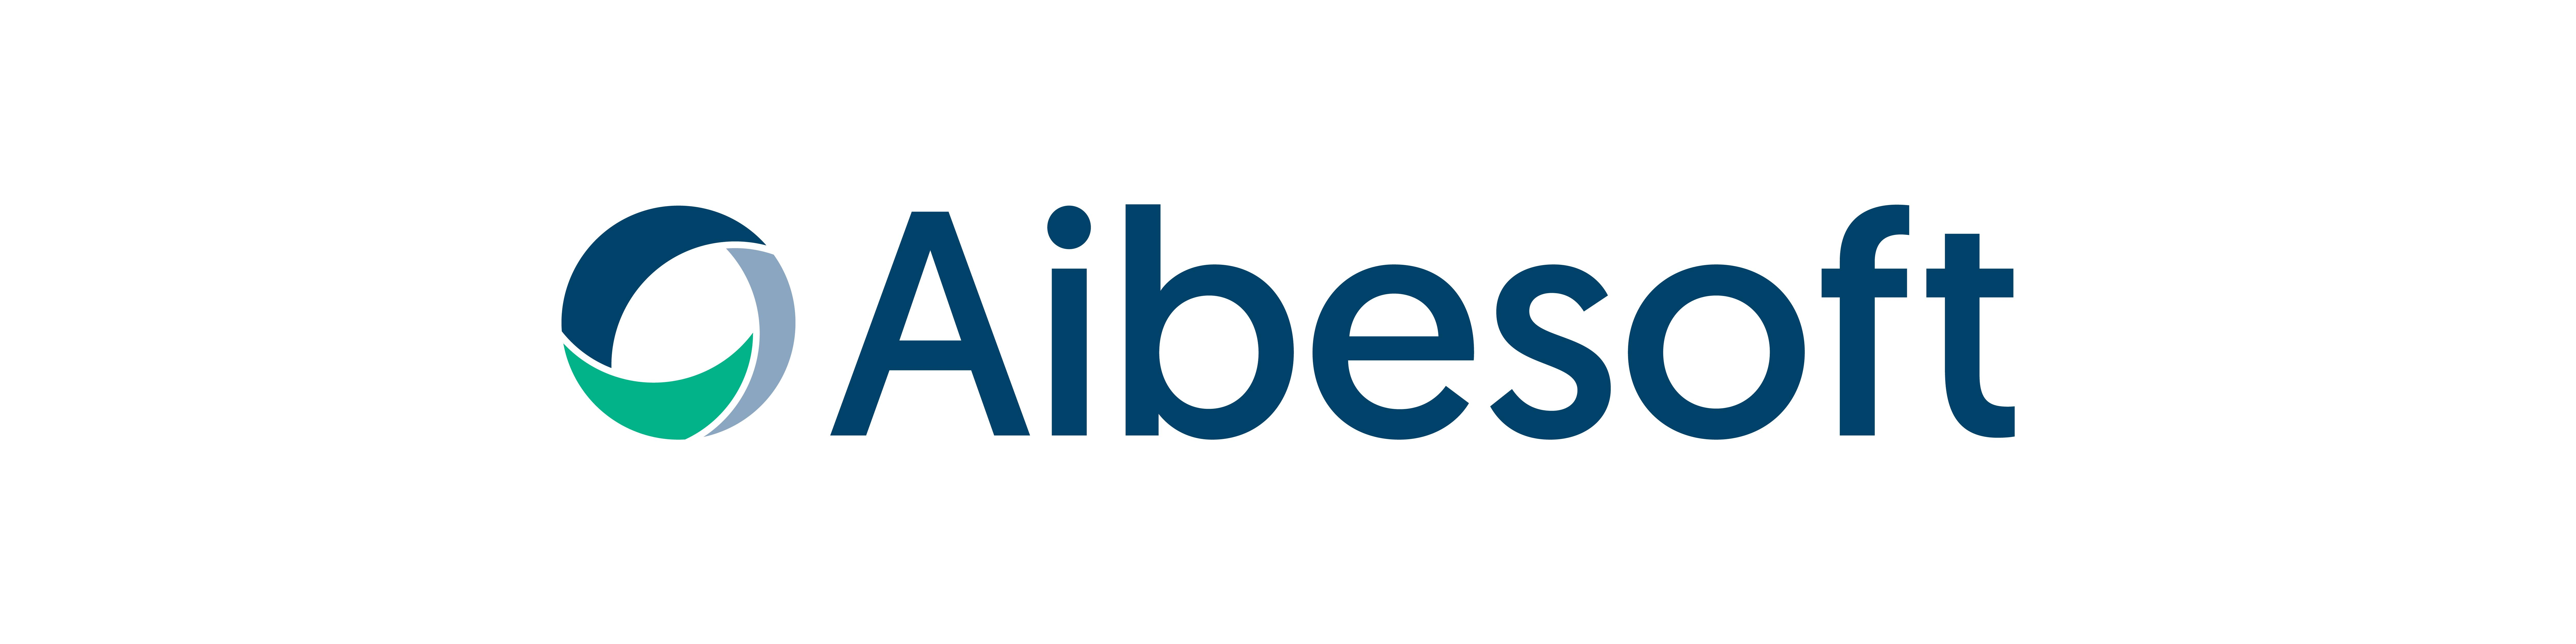 https://www.aibegroup.com/wp-content/uploads/2020/09/Logo-Aibesoft-Inicio.jpg